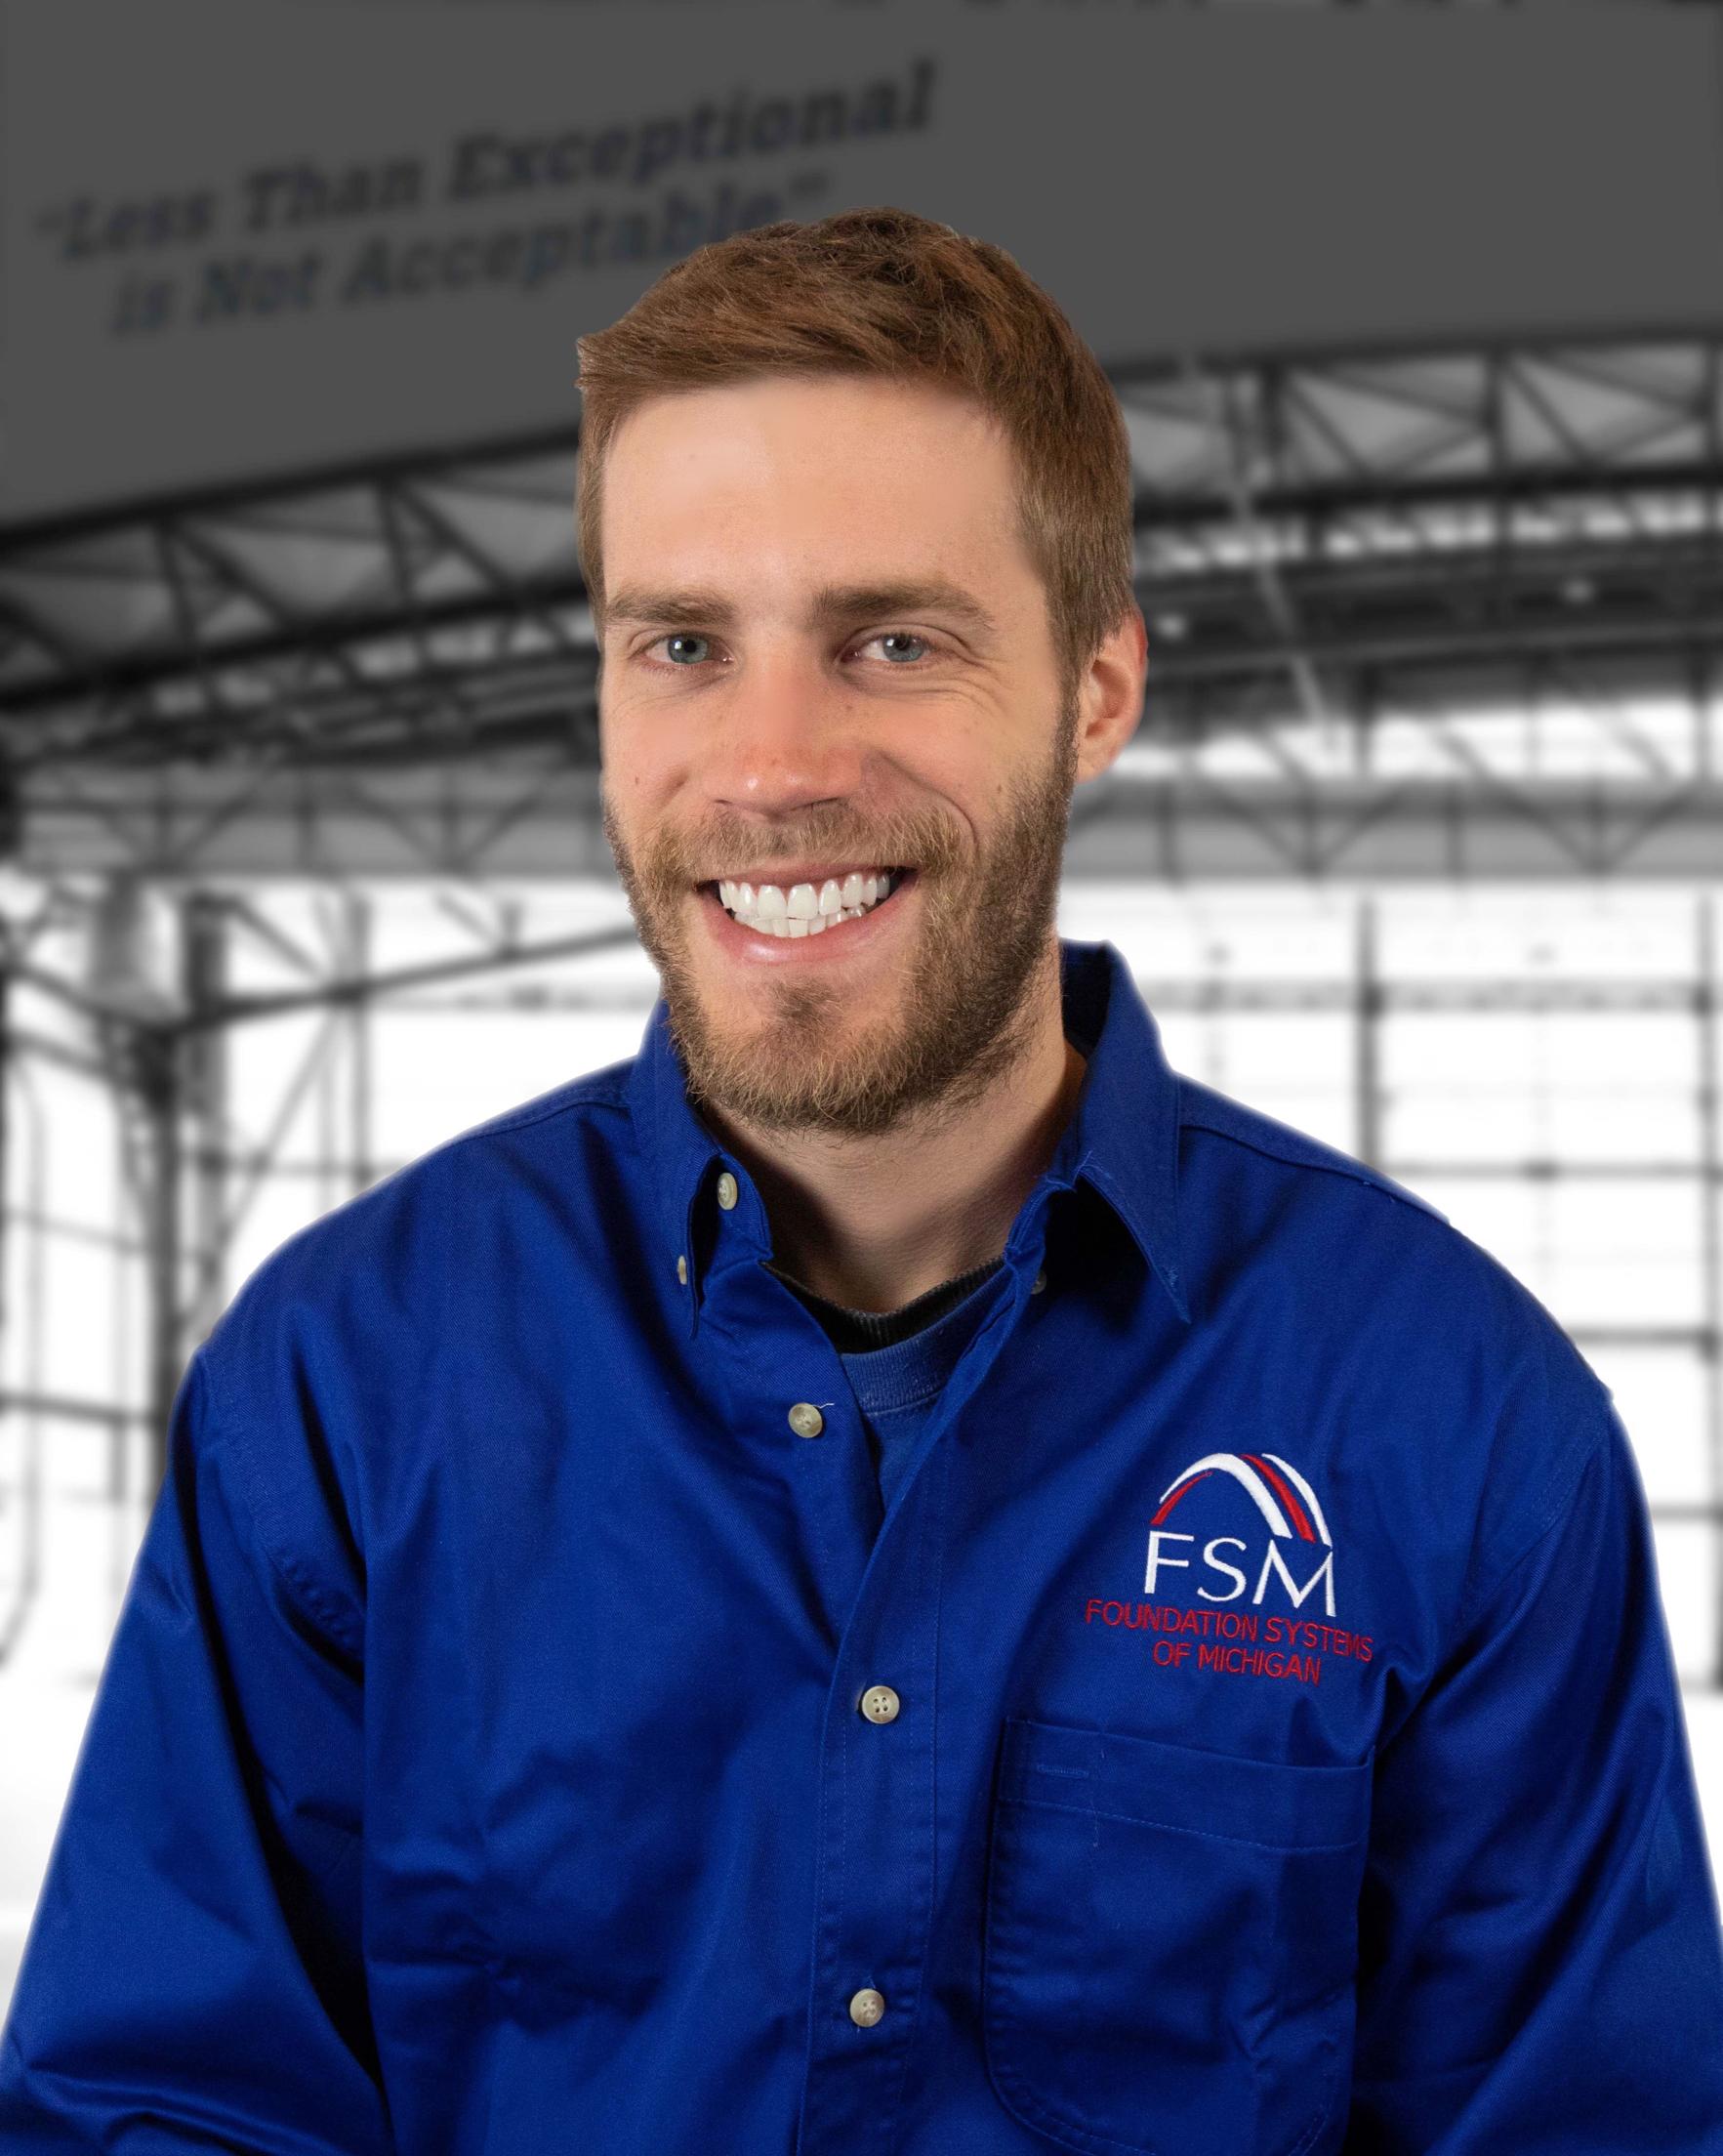 FSM Brad Farthing Service Technician